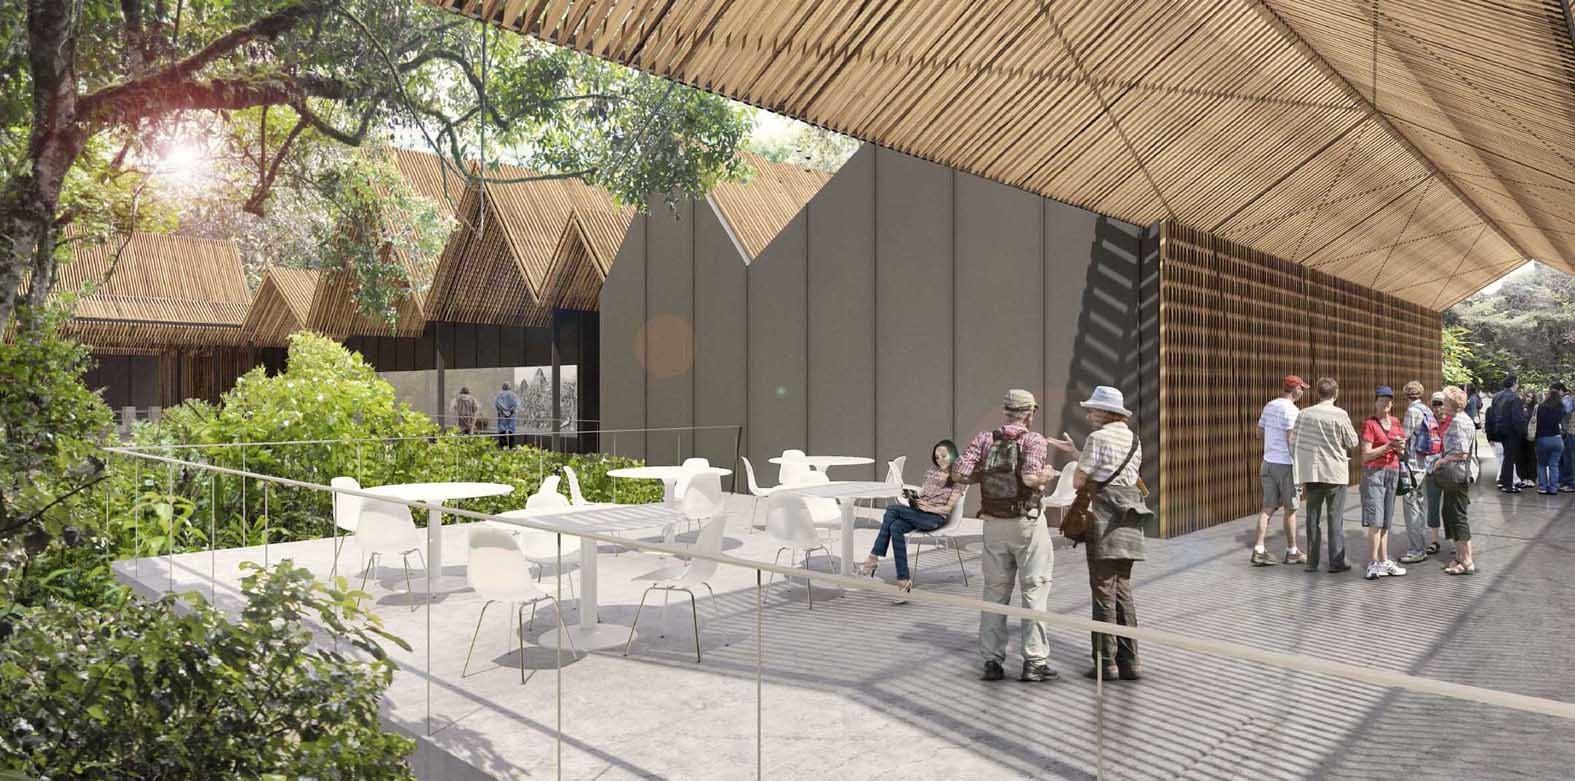 Courtesy of FD Arquitectos + Abalosllopis Arquitectos